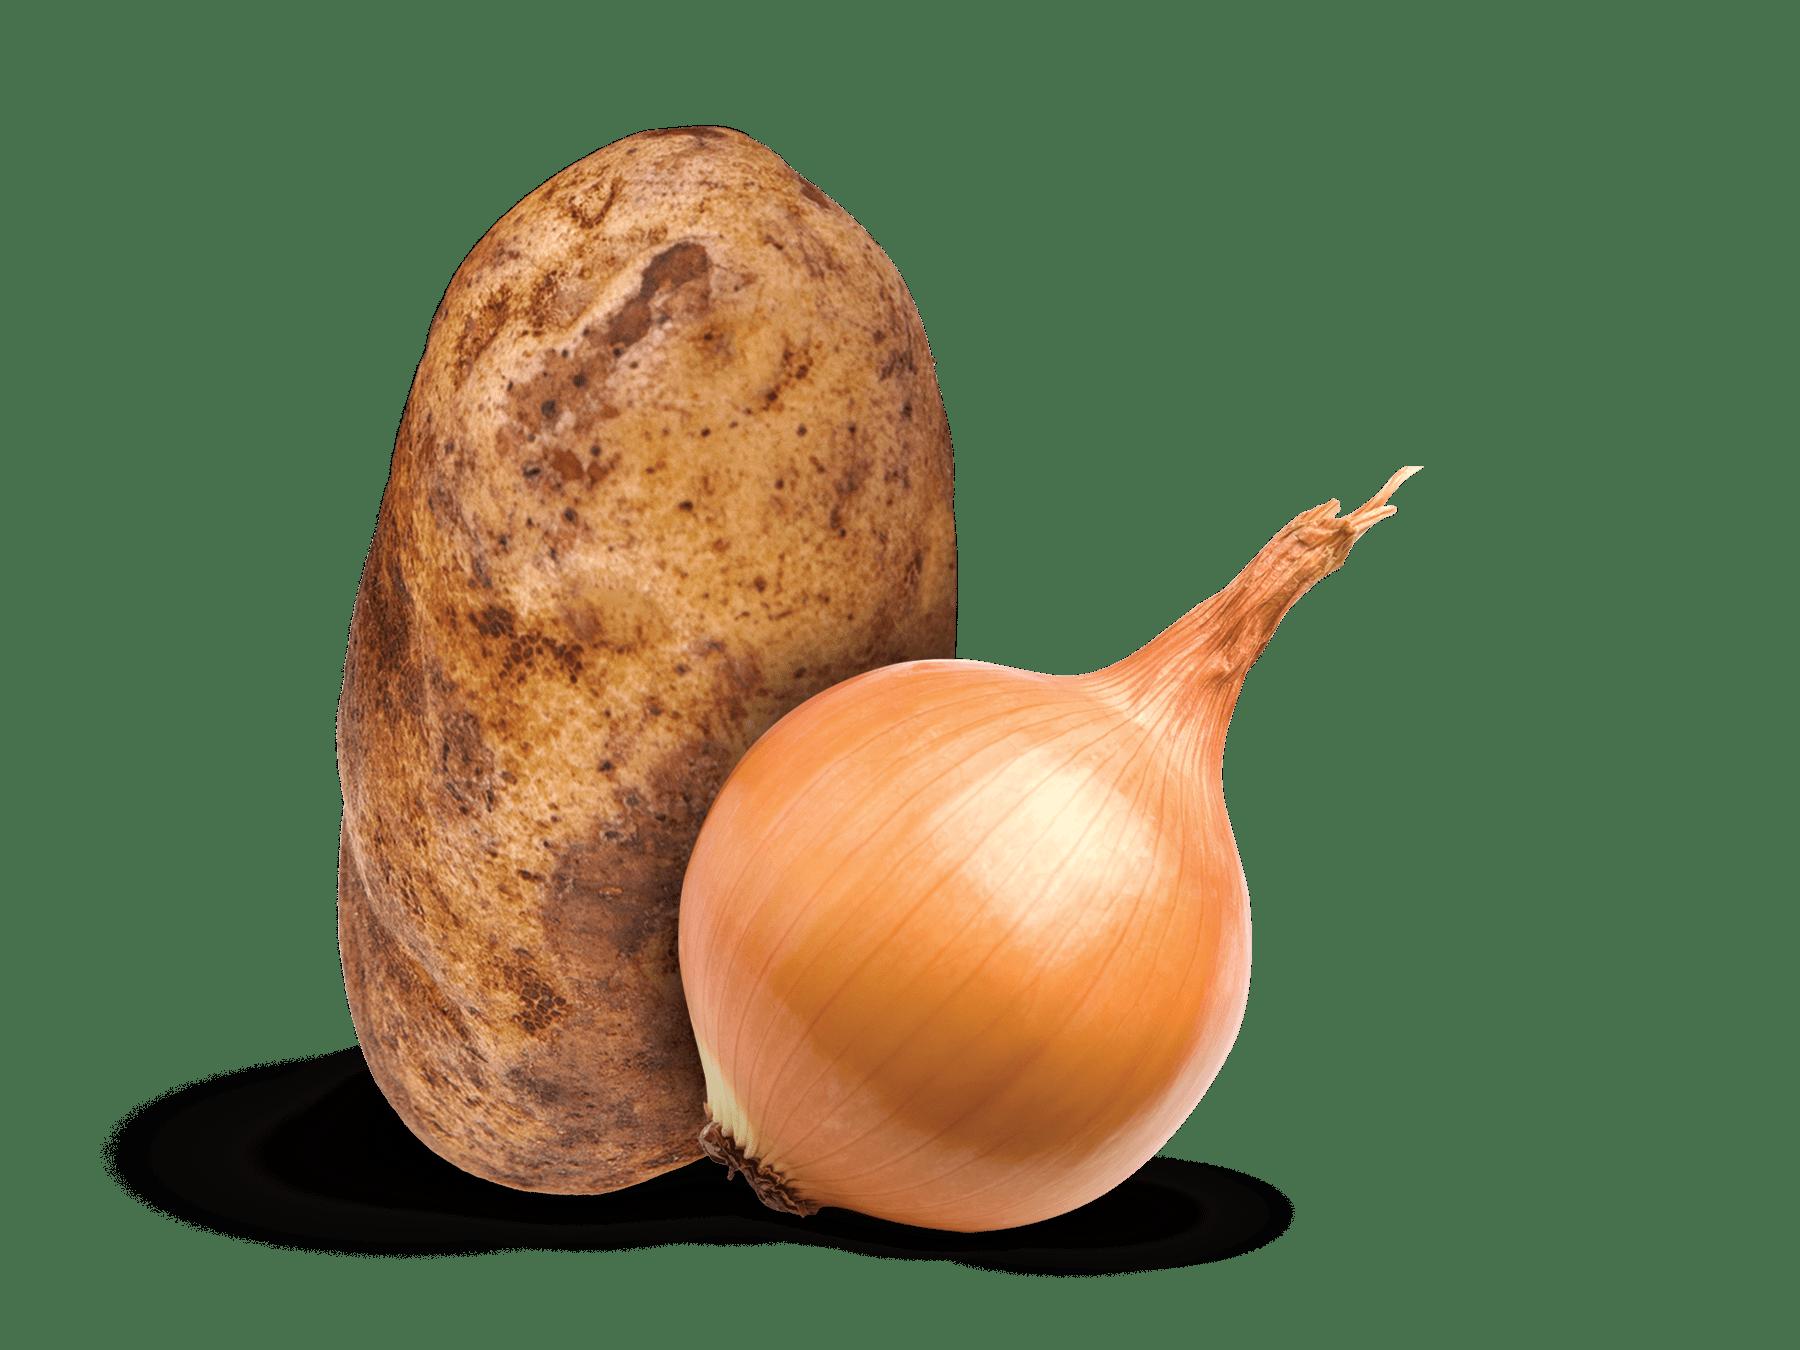 Suberizer Potato and Onion Storage